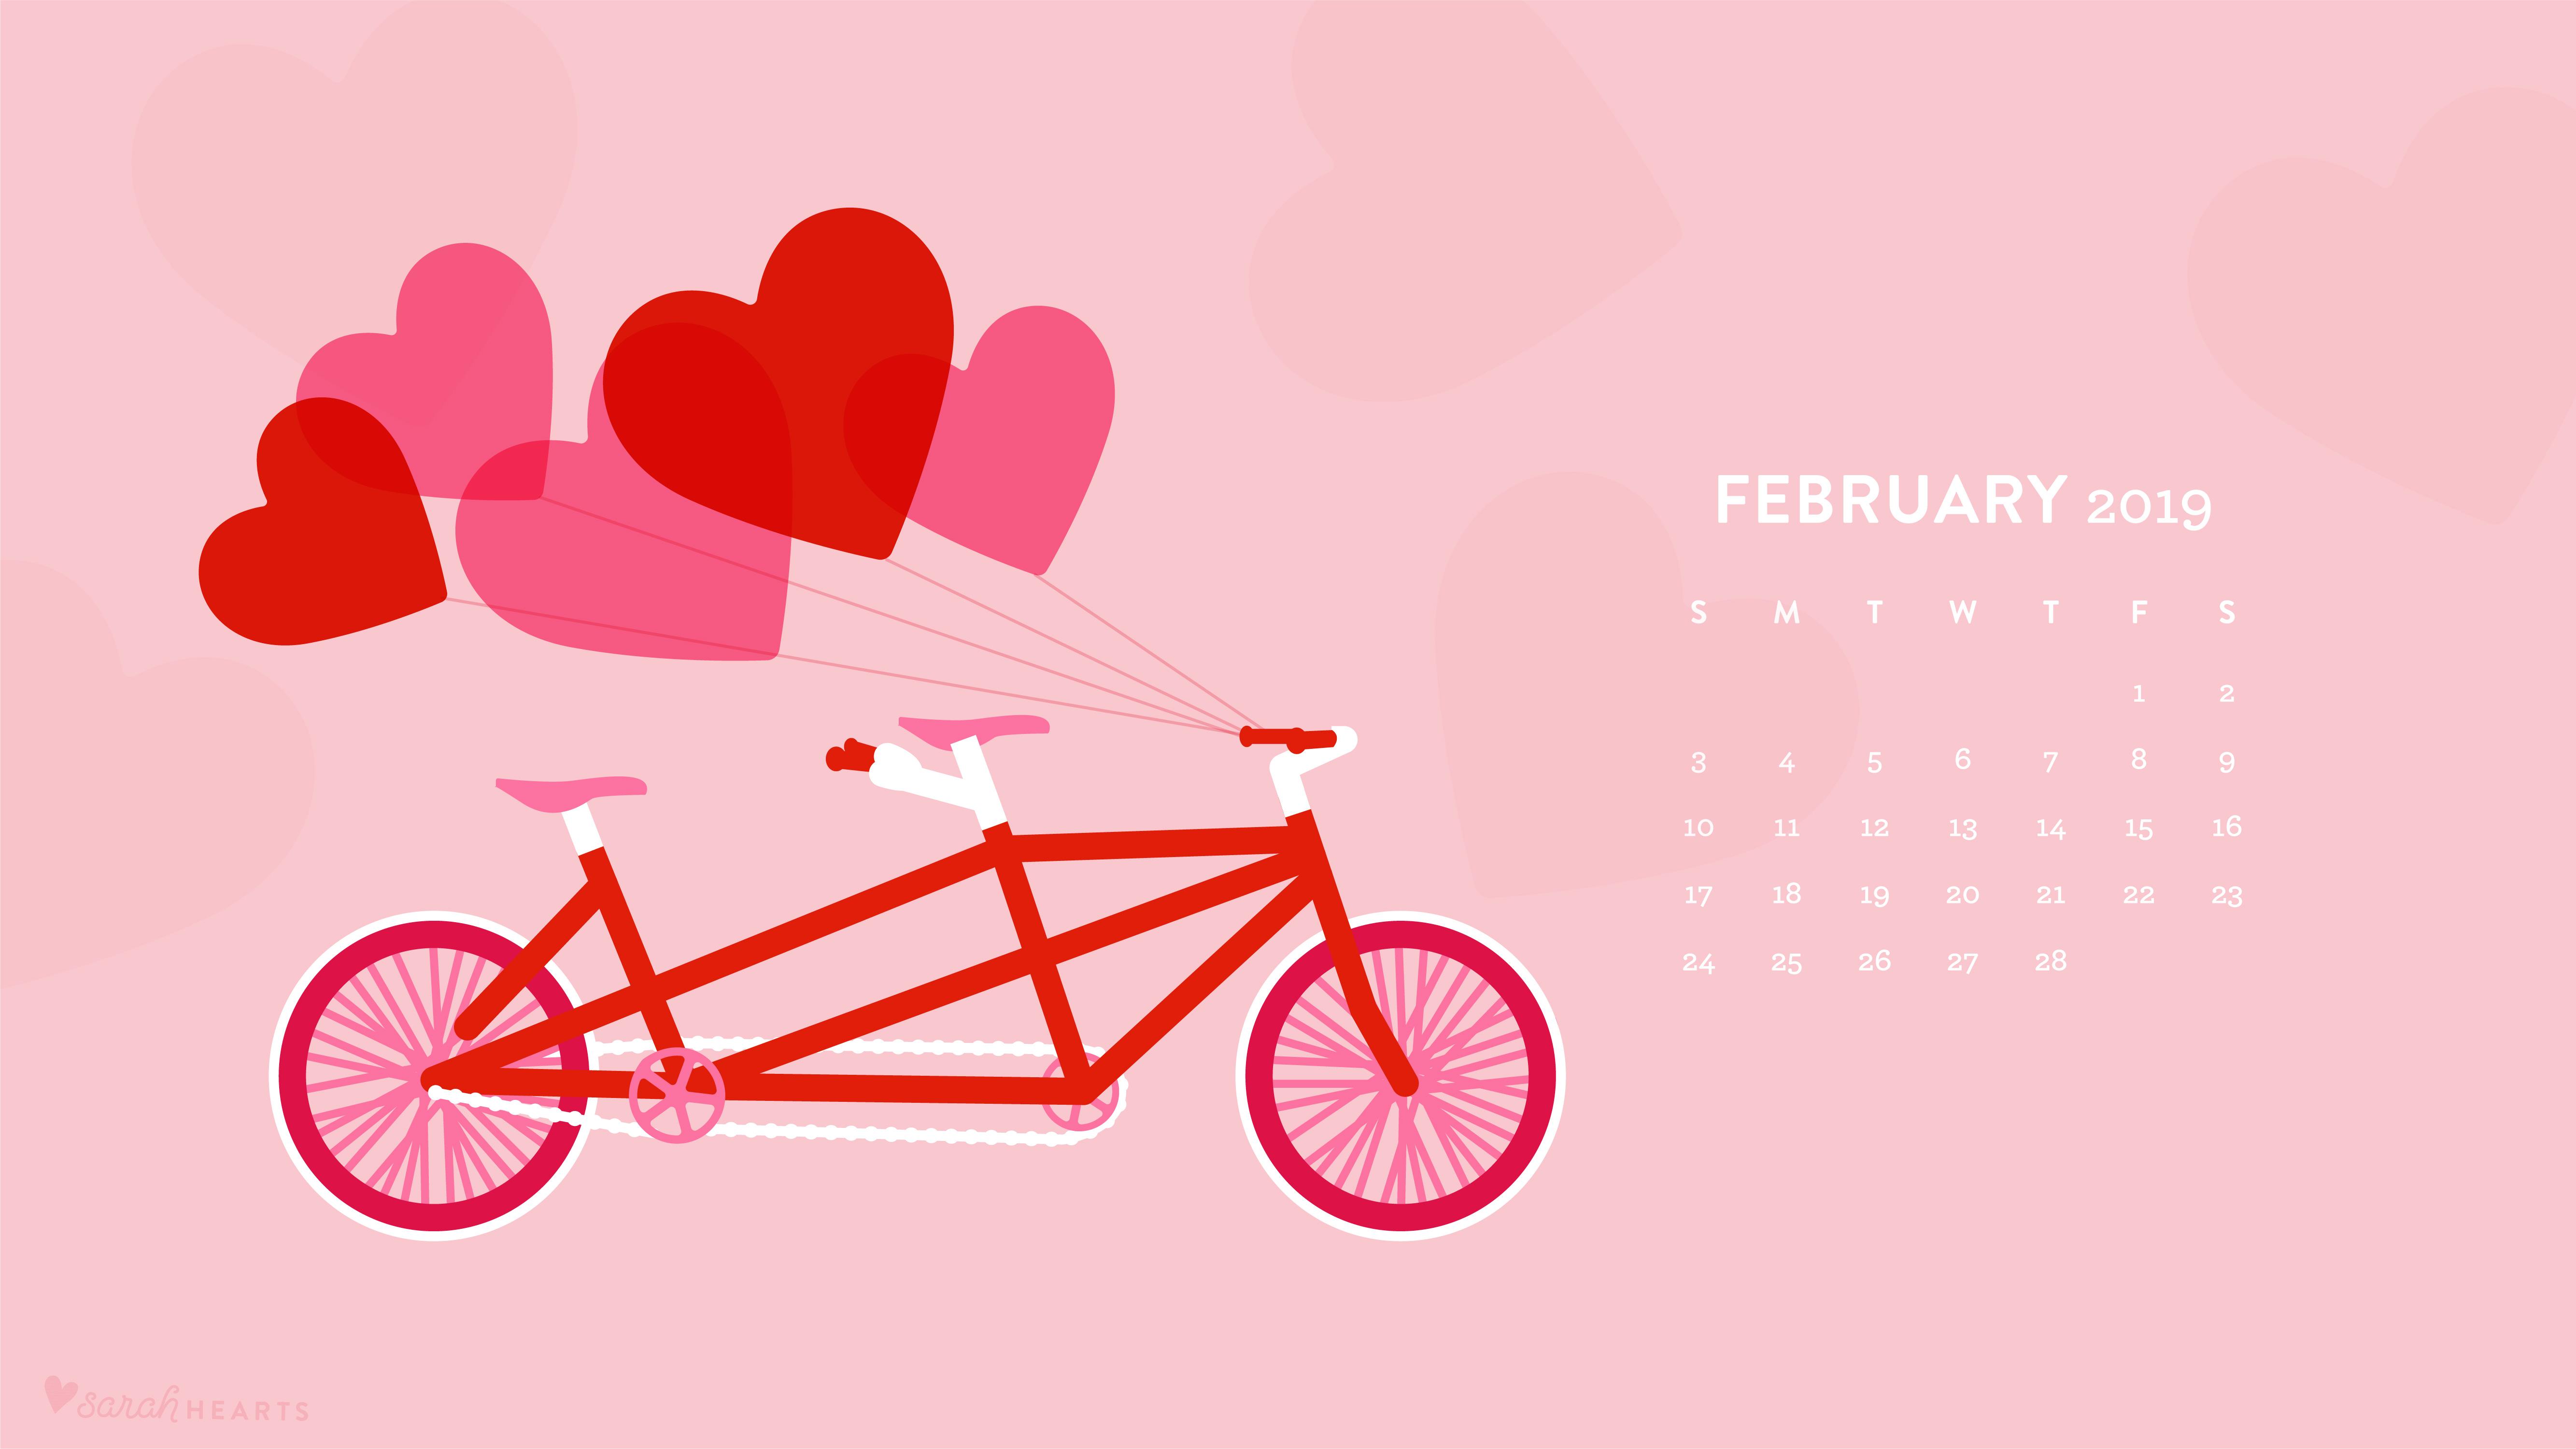 February Wallpaper Calendar 2019 February 2019 Tandem Bike Calendar Wallpaper   Sarah Hearts